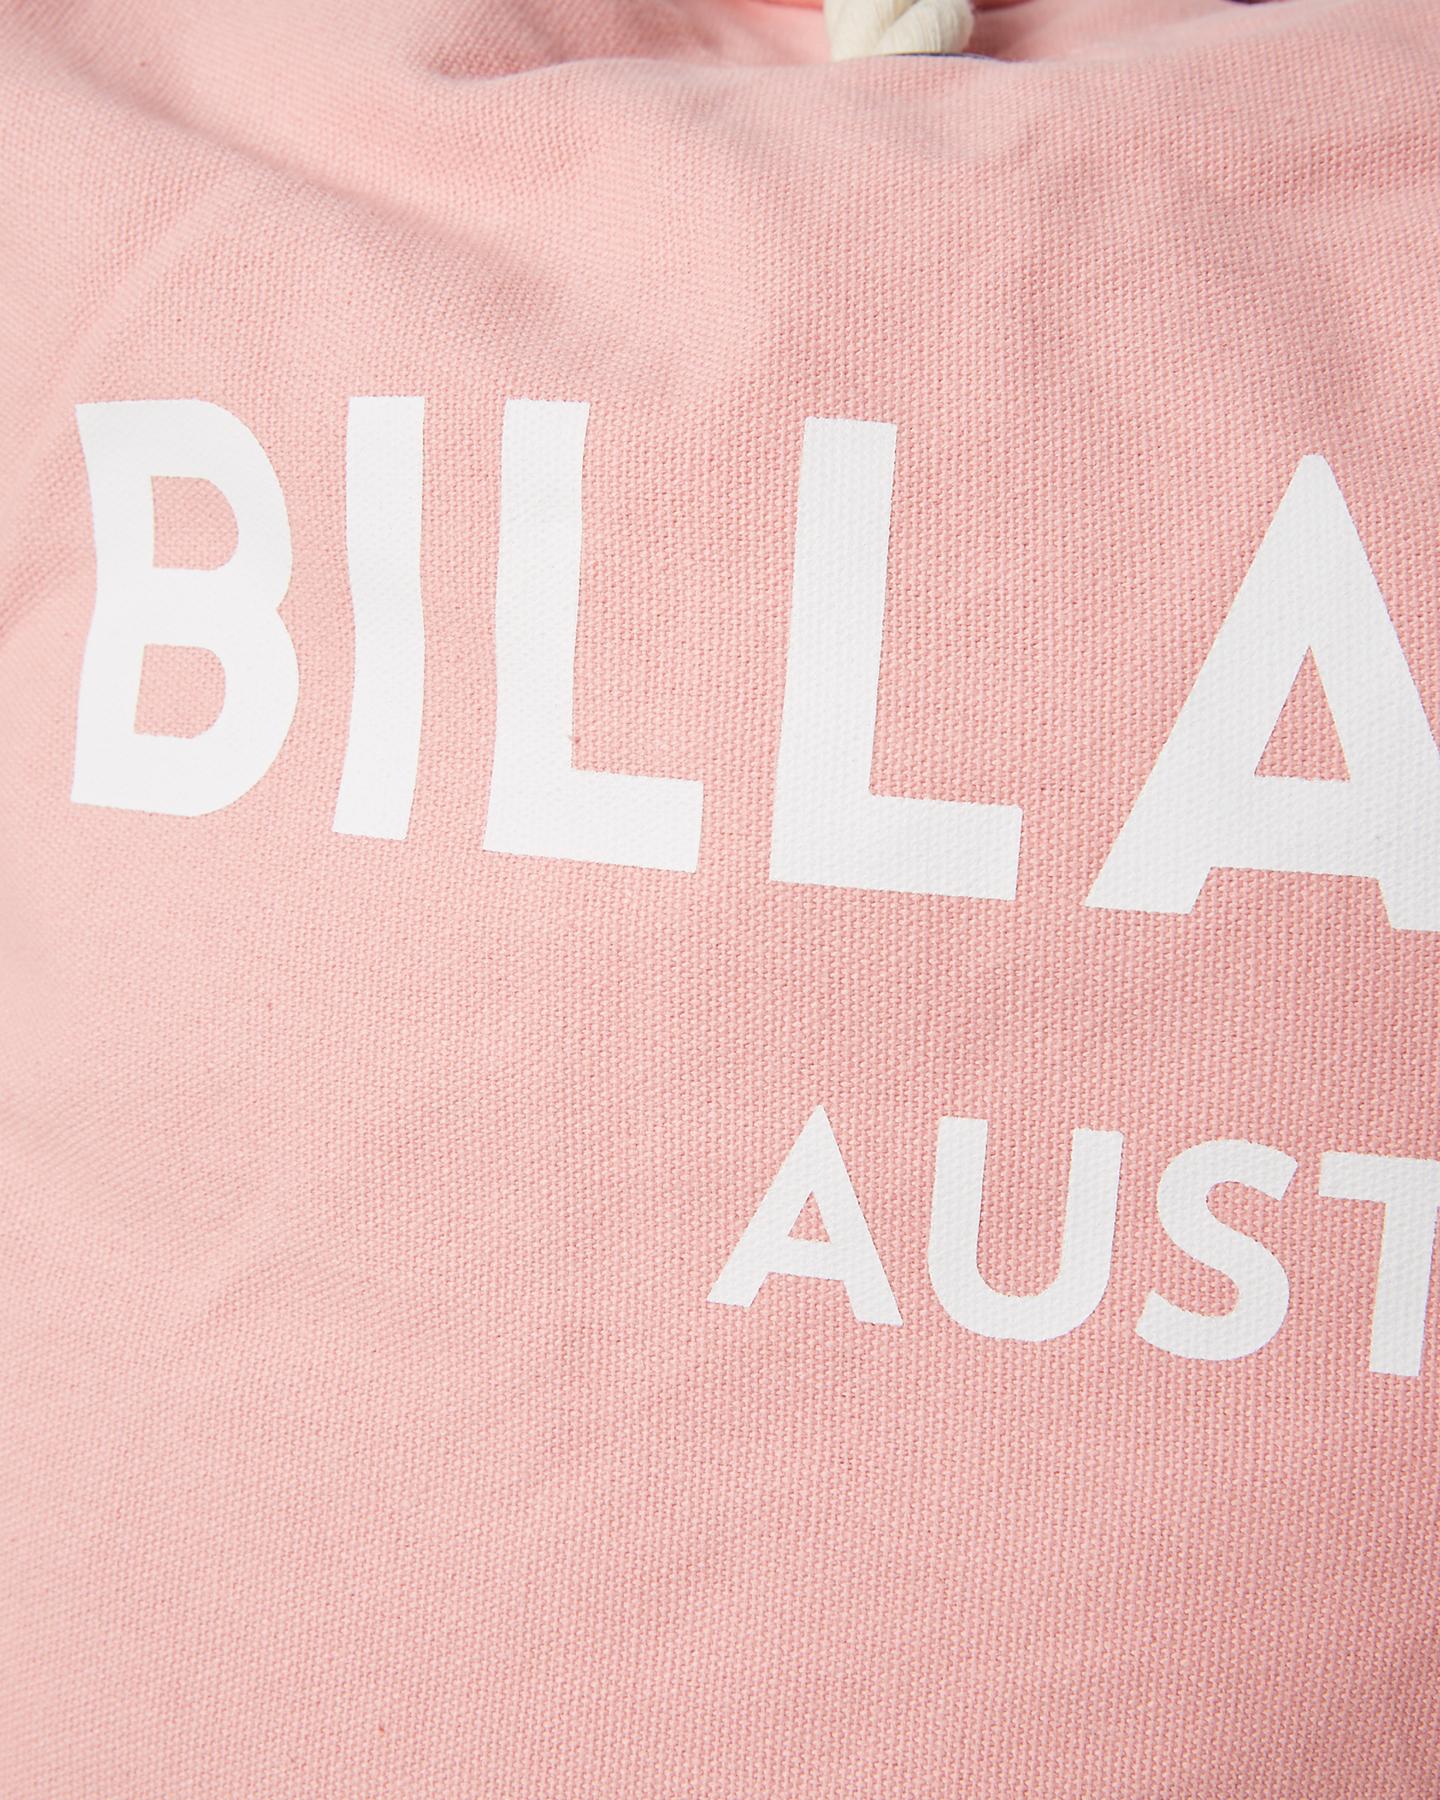 59368ca7895b Billabong Women s Essential Beach Bag Cotton Nylon Pink ...